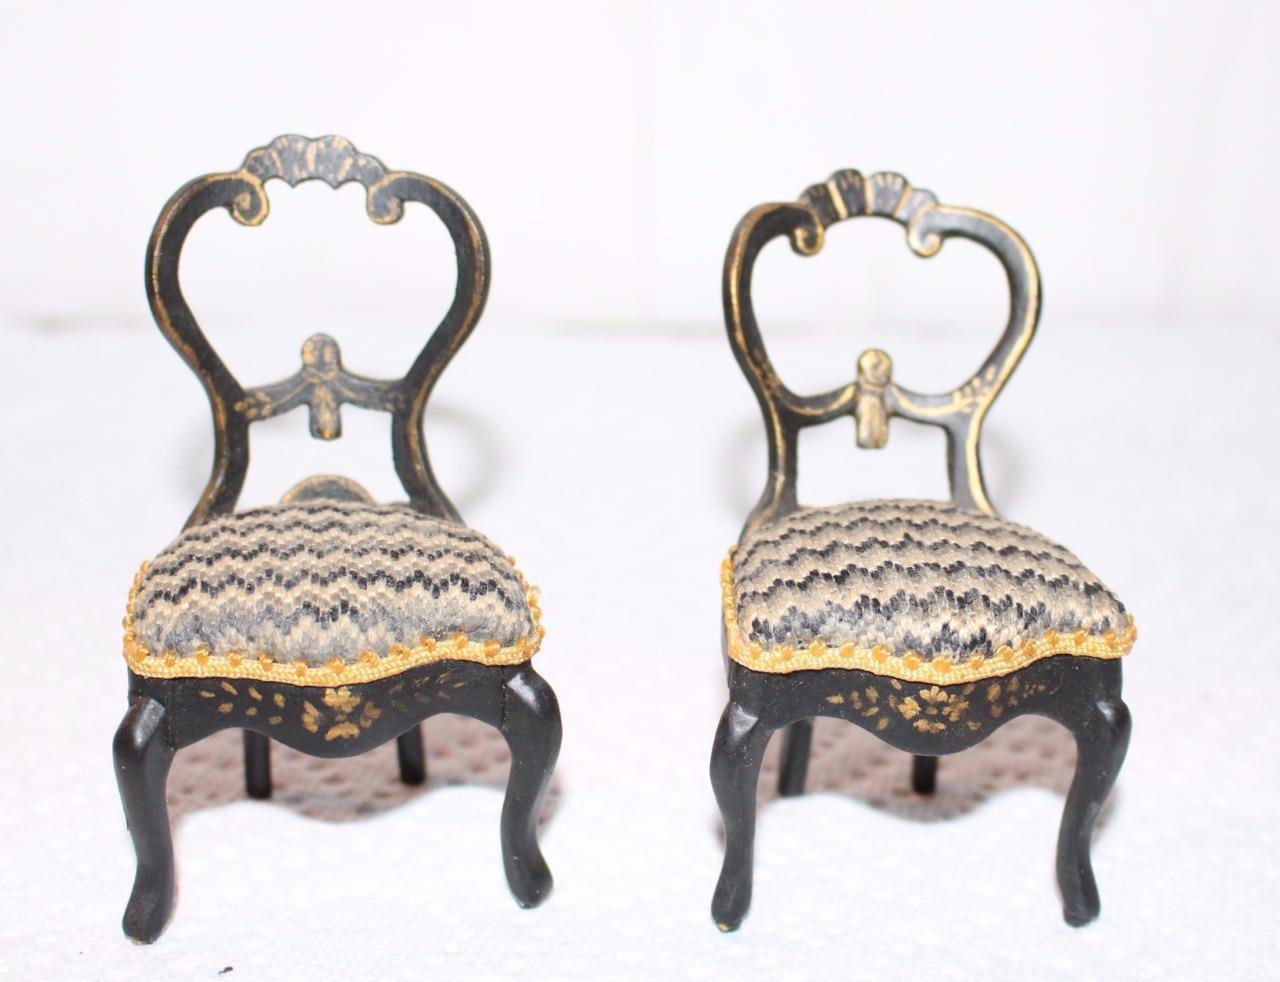 Dollhouse Miniatures Victorian Beidermeier Chairs Pair Artisan Painted Gold